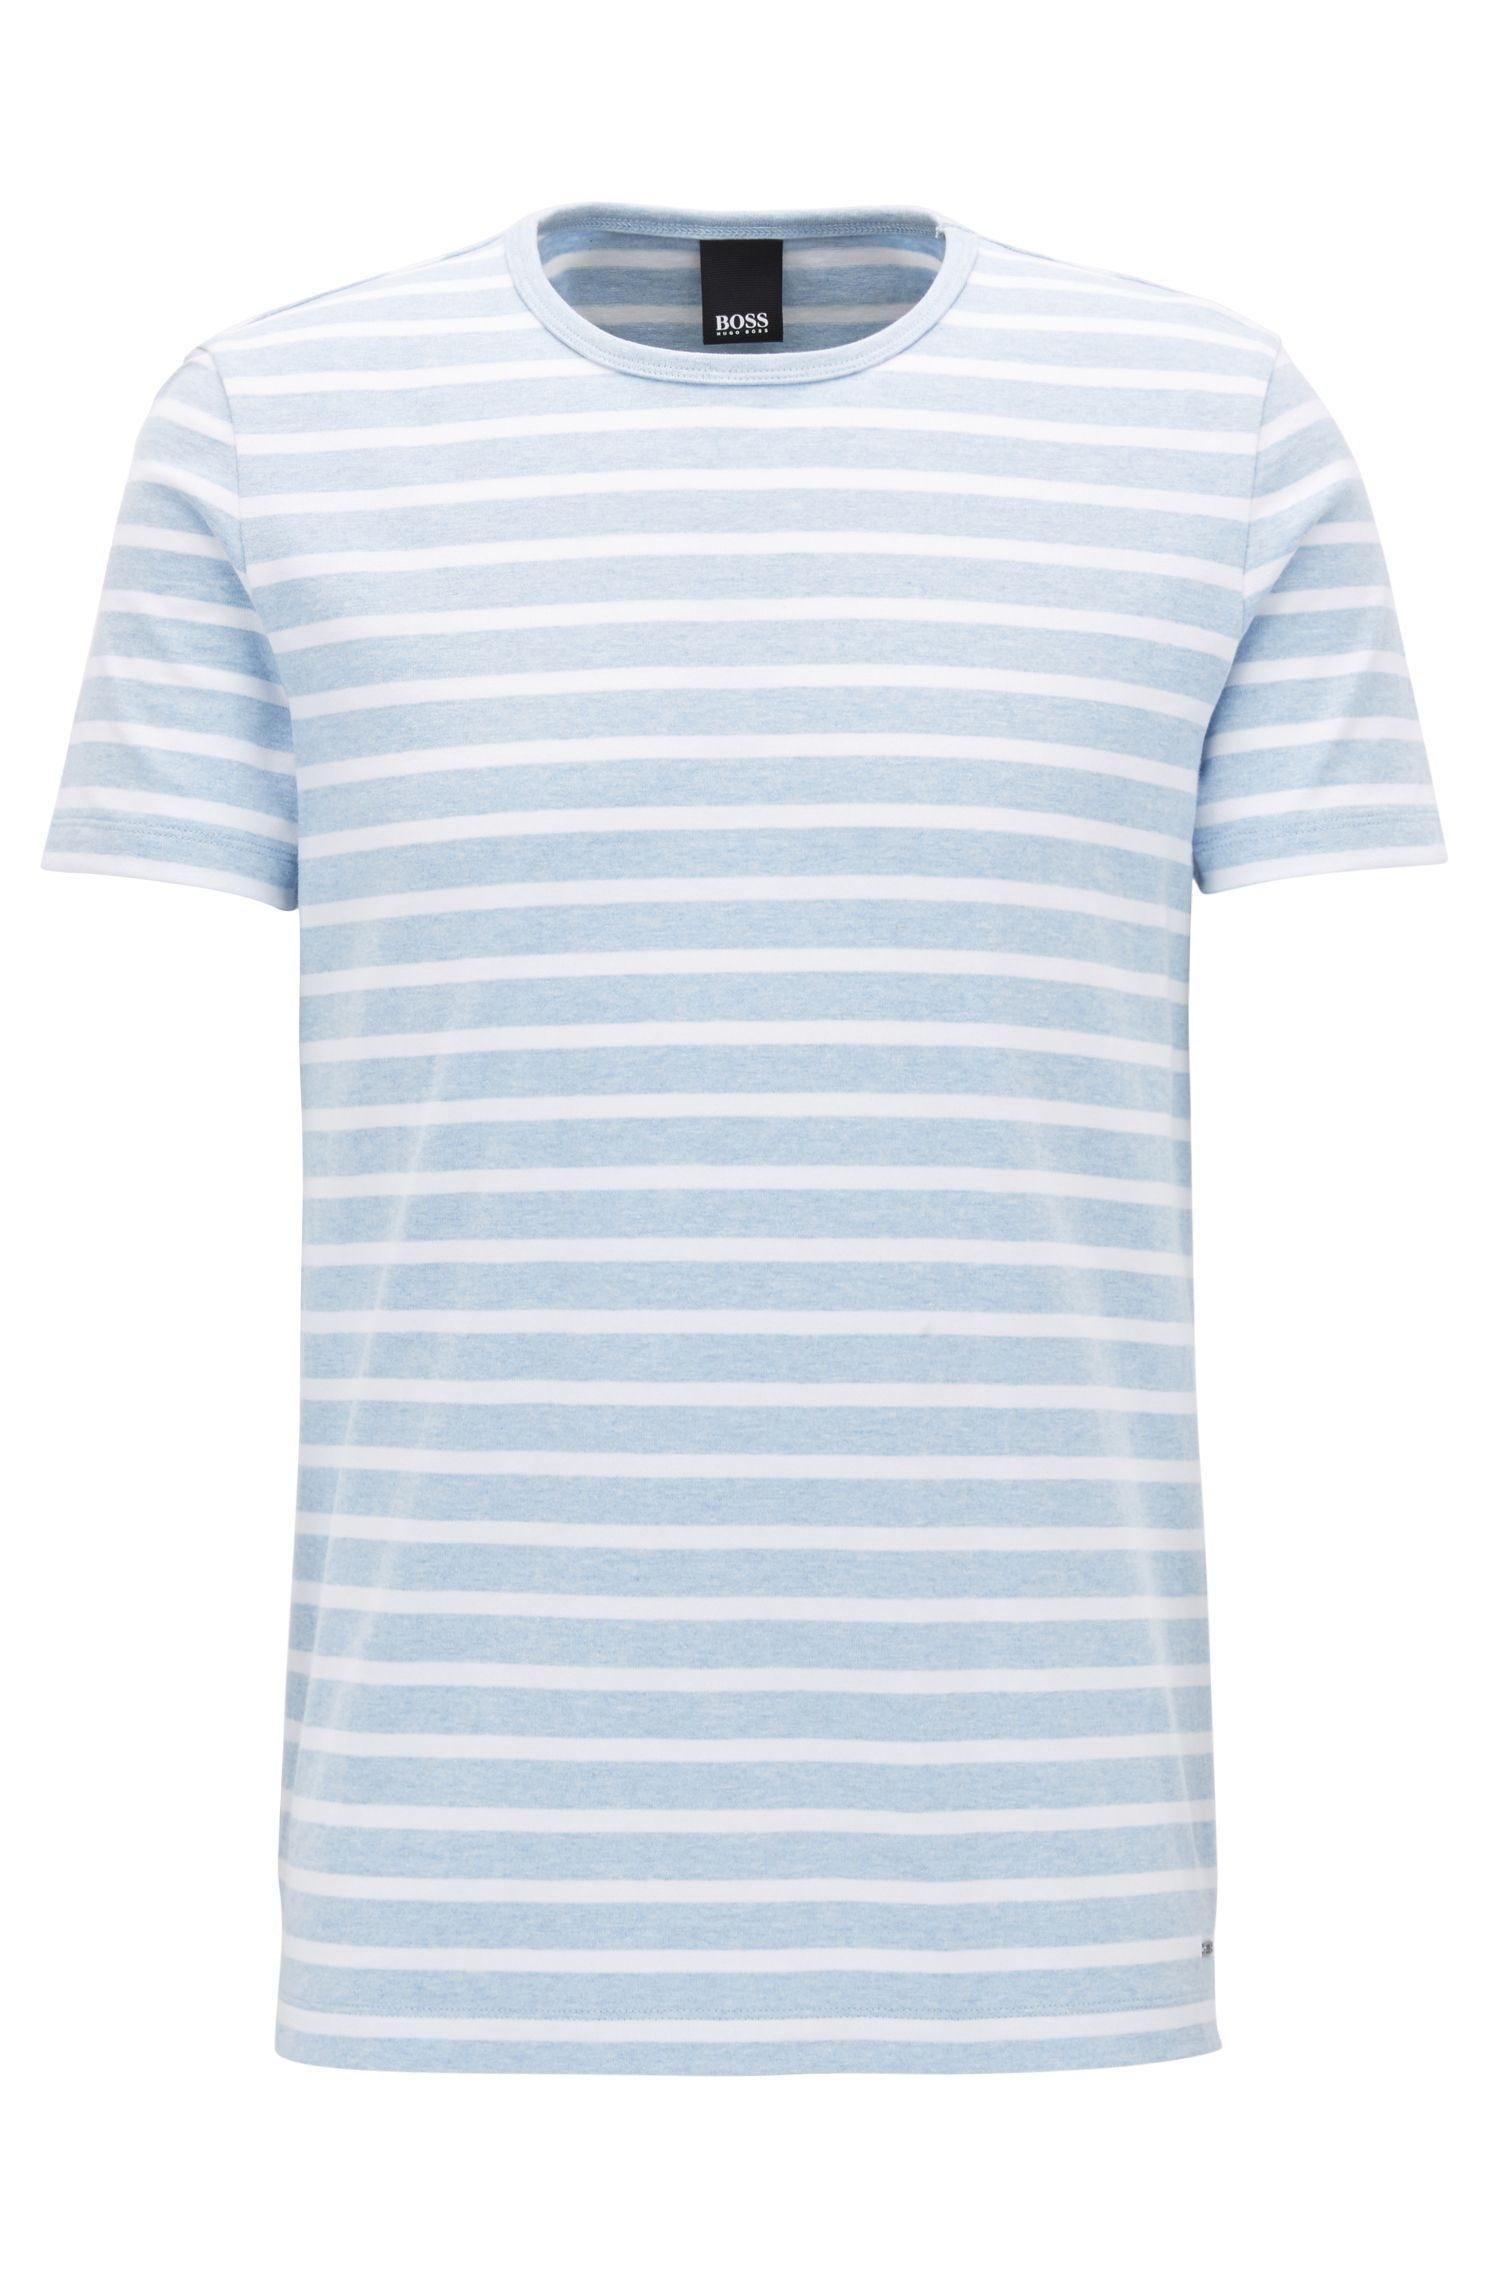 Striped Cotton T-Shirt | Tessler